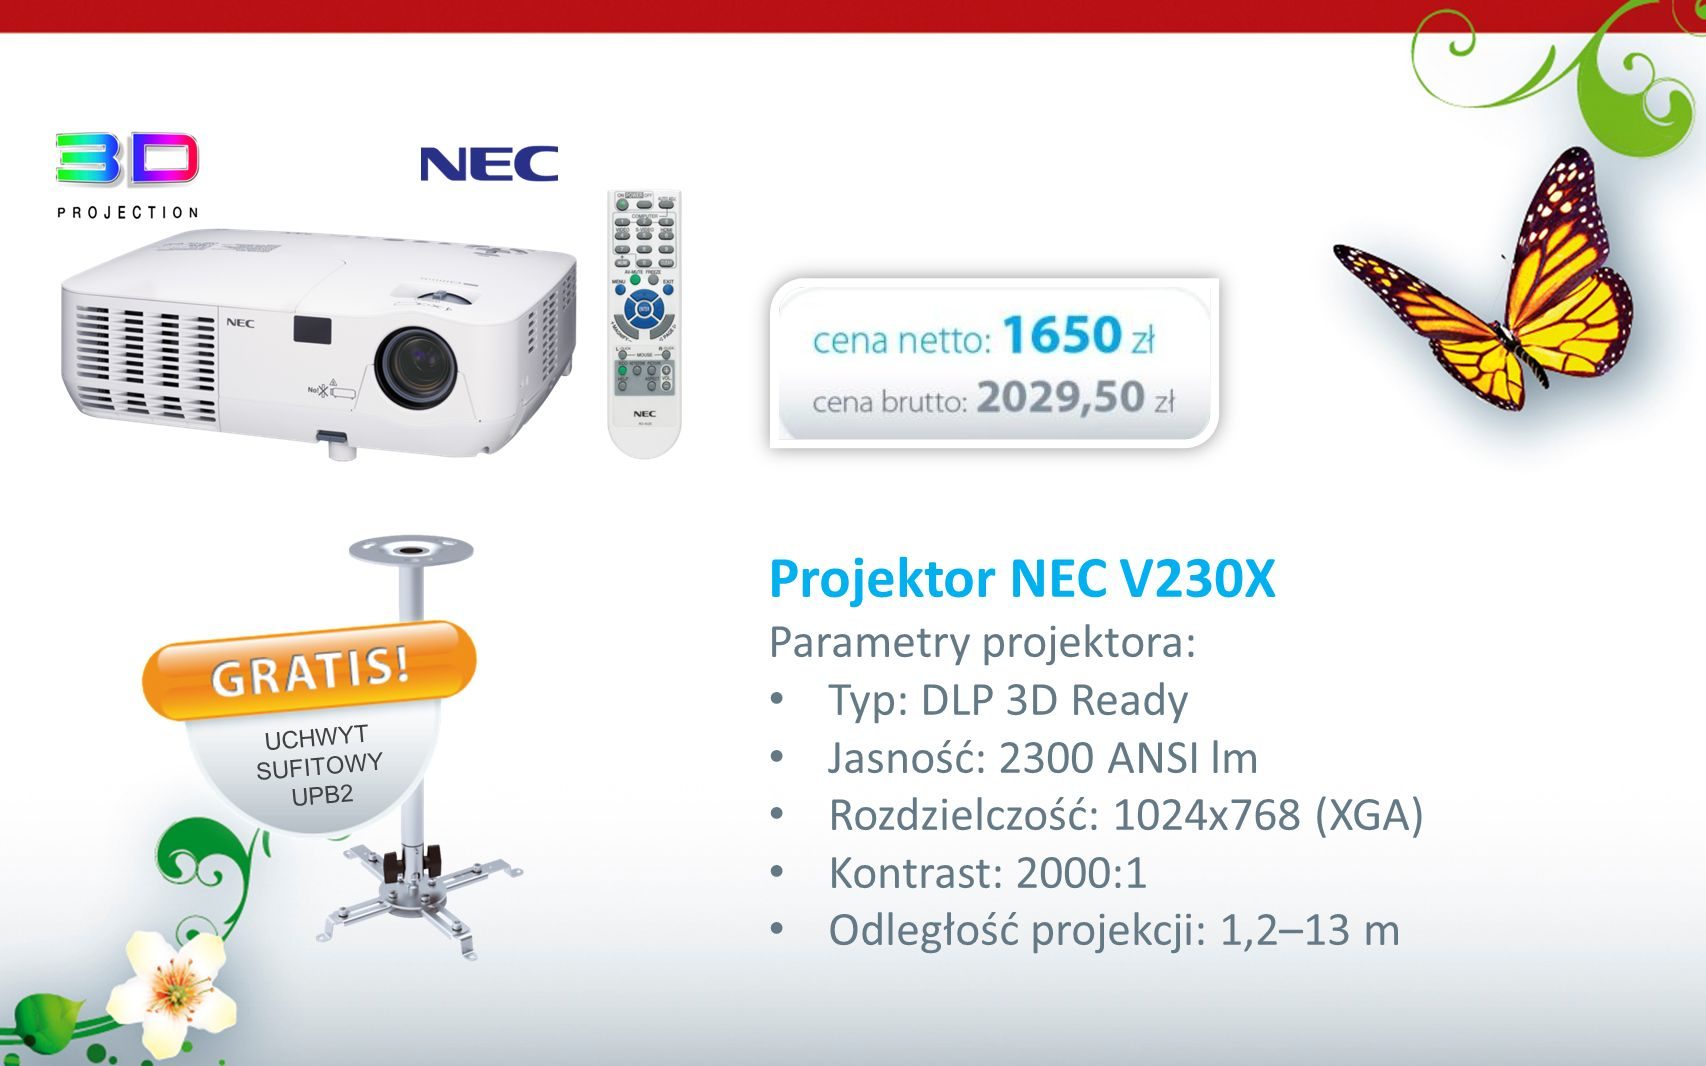 Projektor NEC V230X Parametry projektora: Typ: DLP 3D Ready